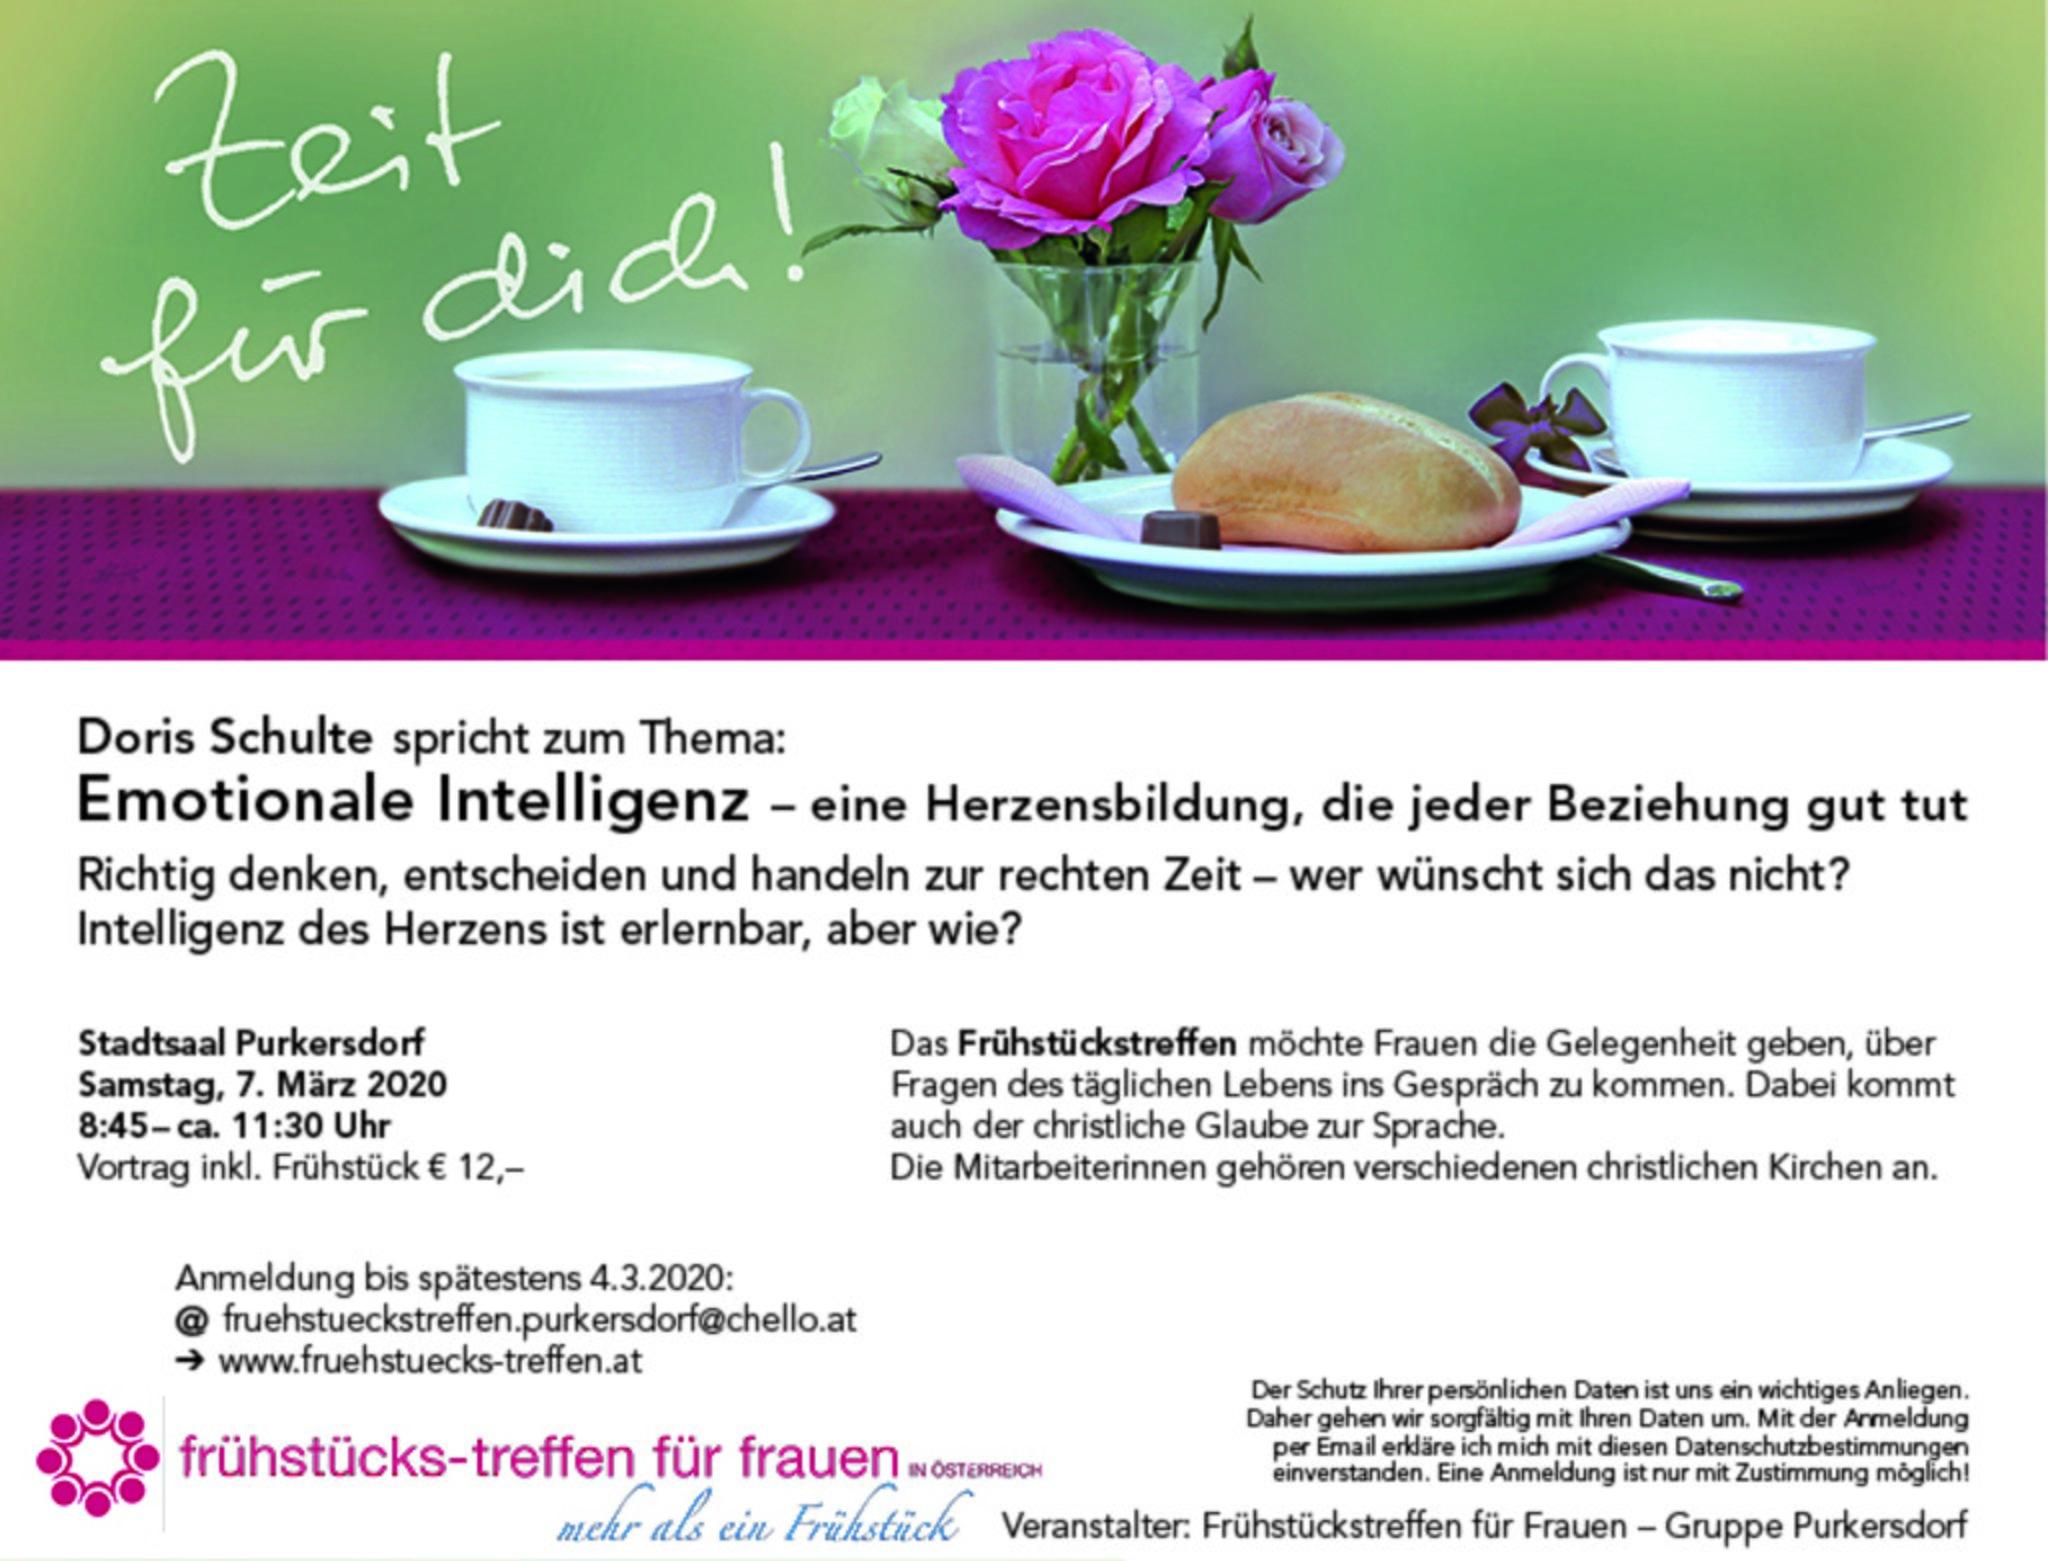 Frauen treffen Frauen, Frauencaf am 22. Februar - Landeck